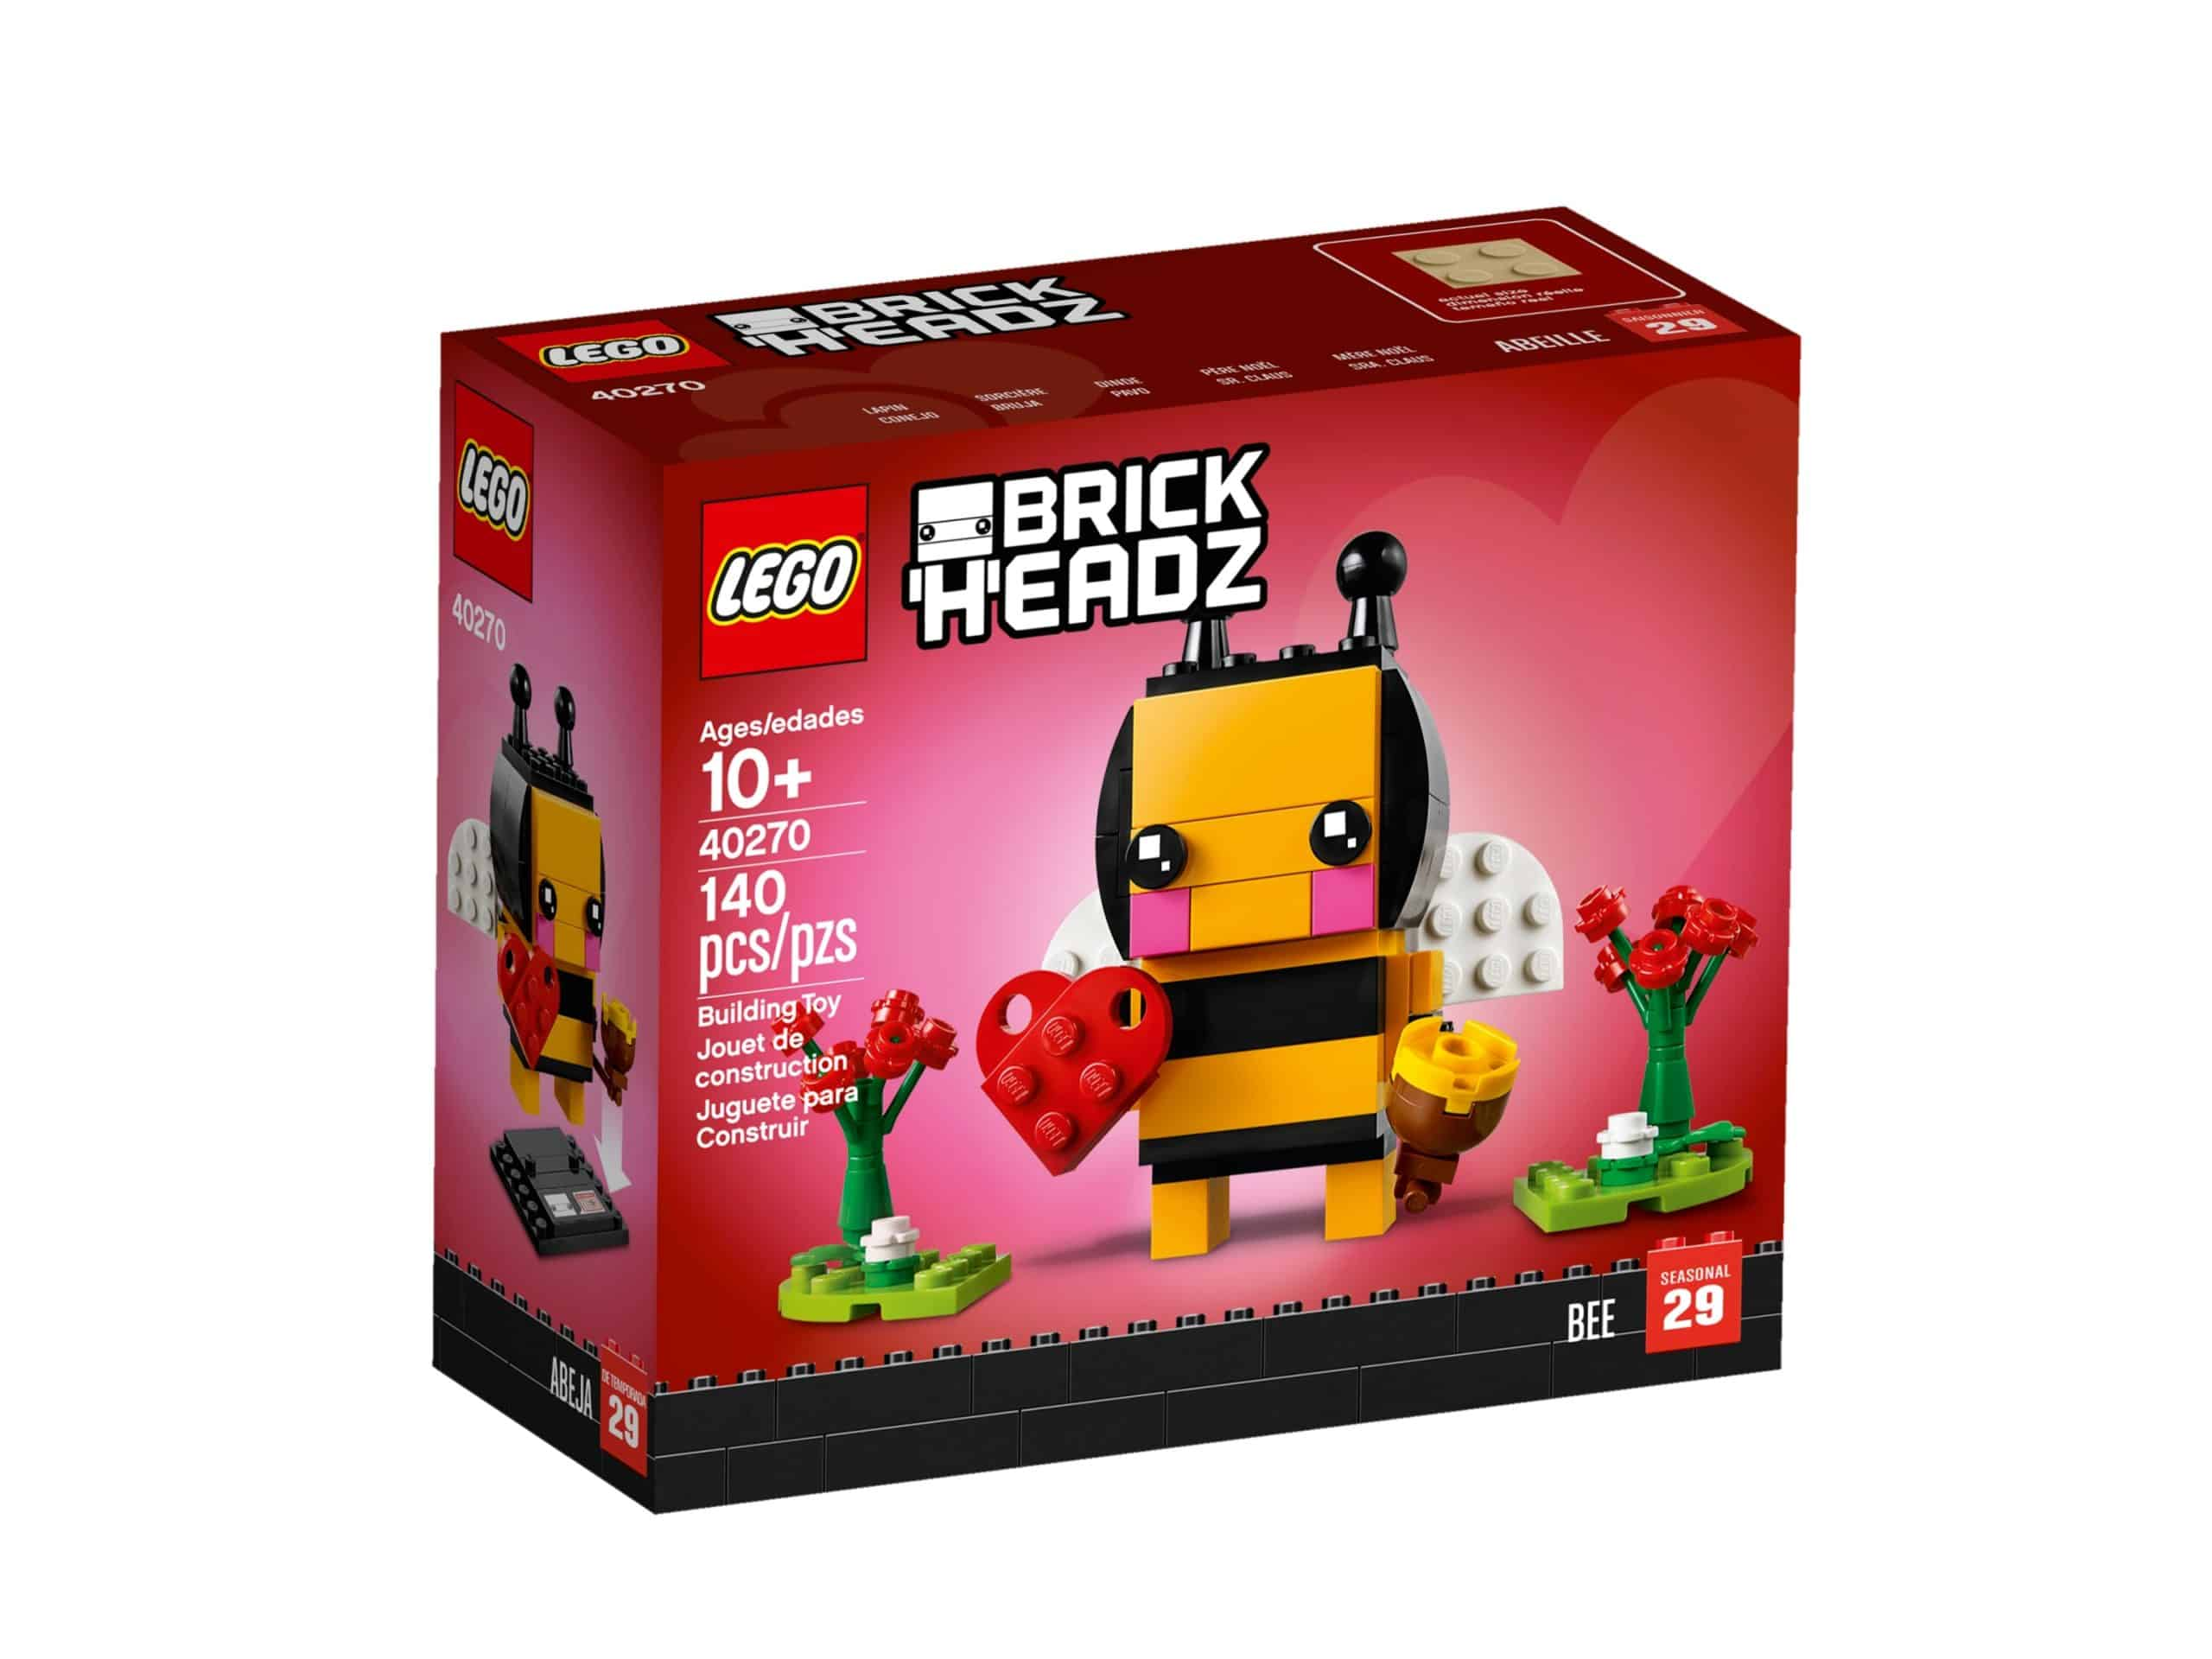 lego 40270 brickheadz bumble bee scaled